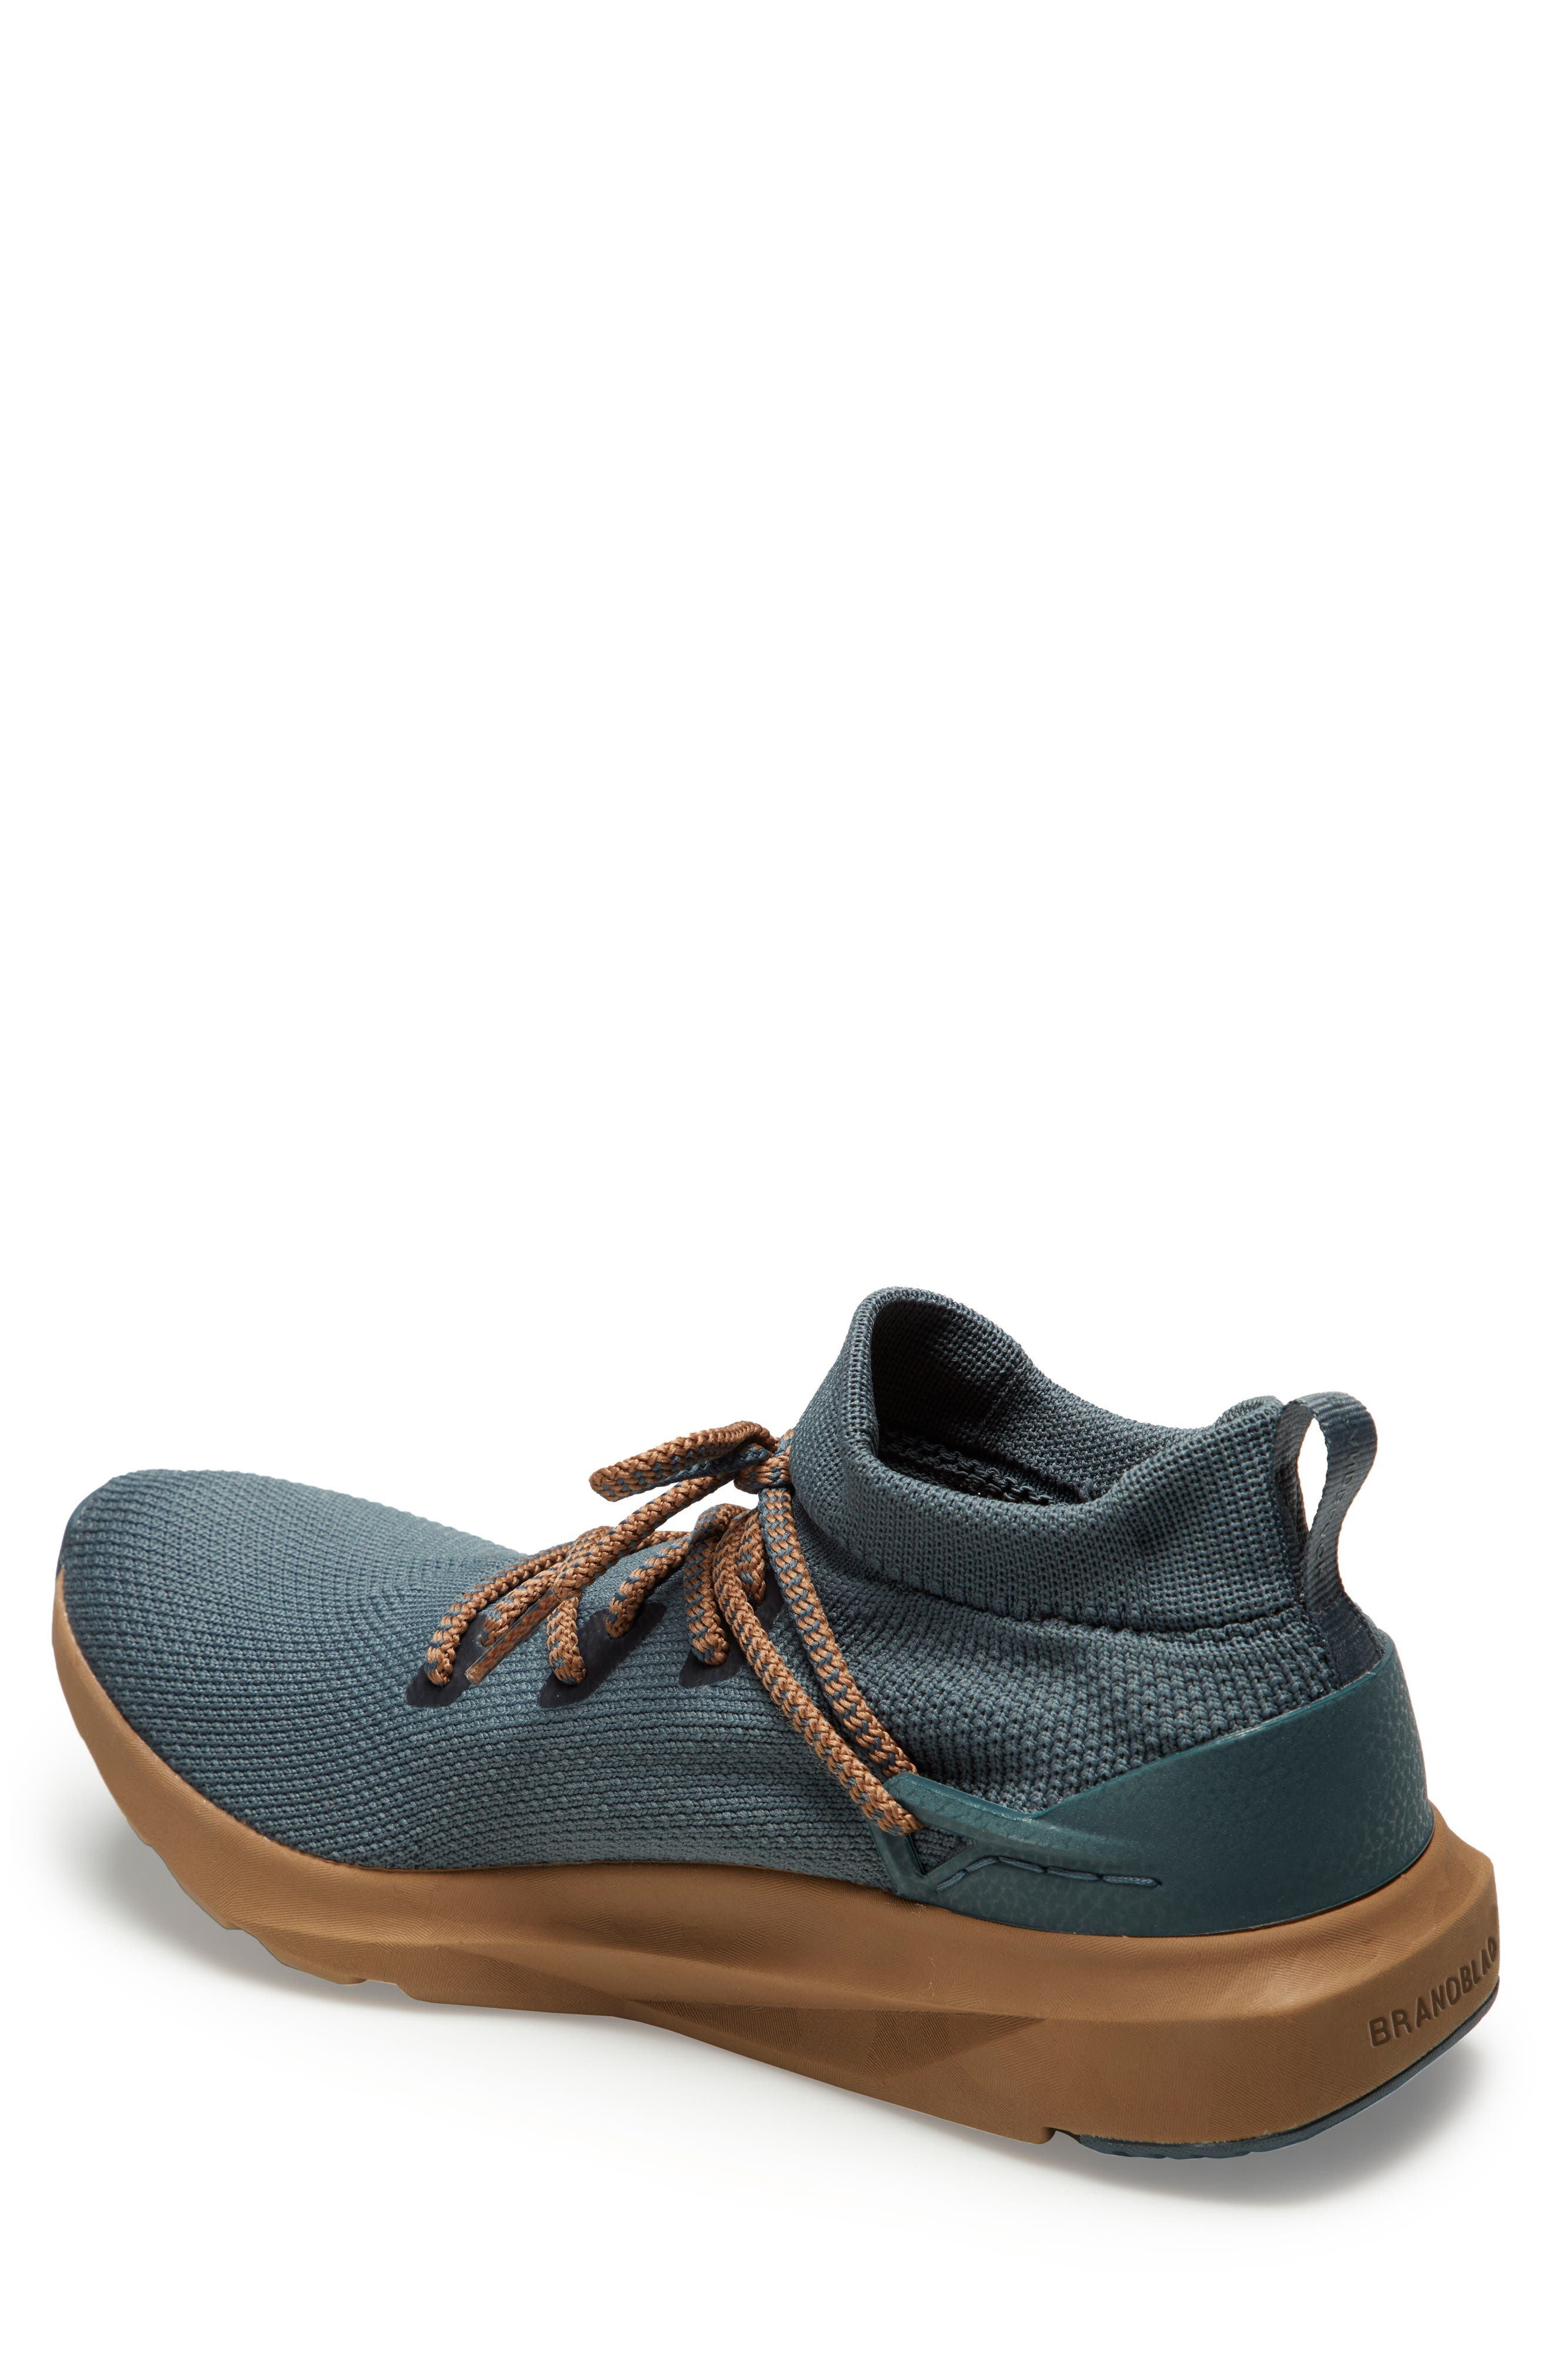 Kaze Sneaker,                             Alternate thumbnail 6, color,